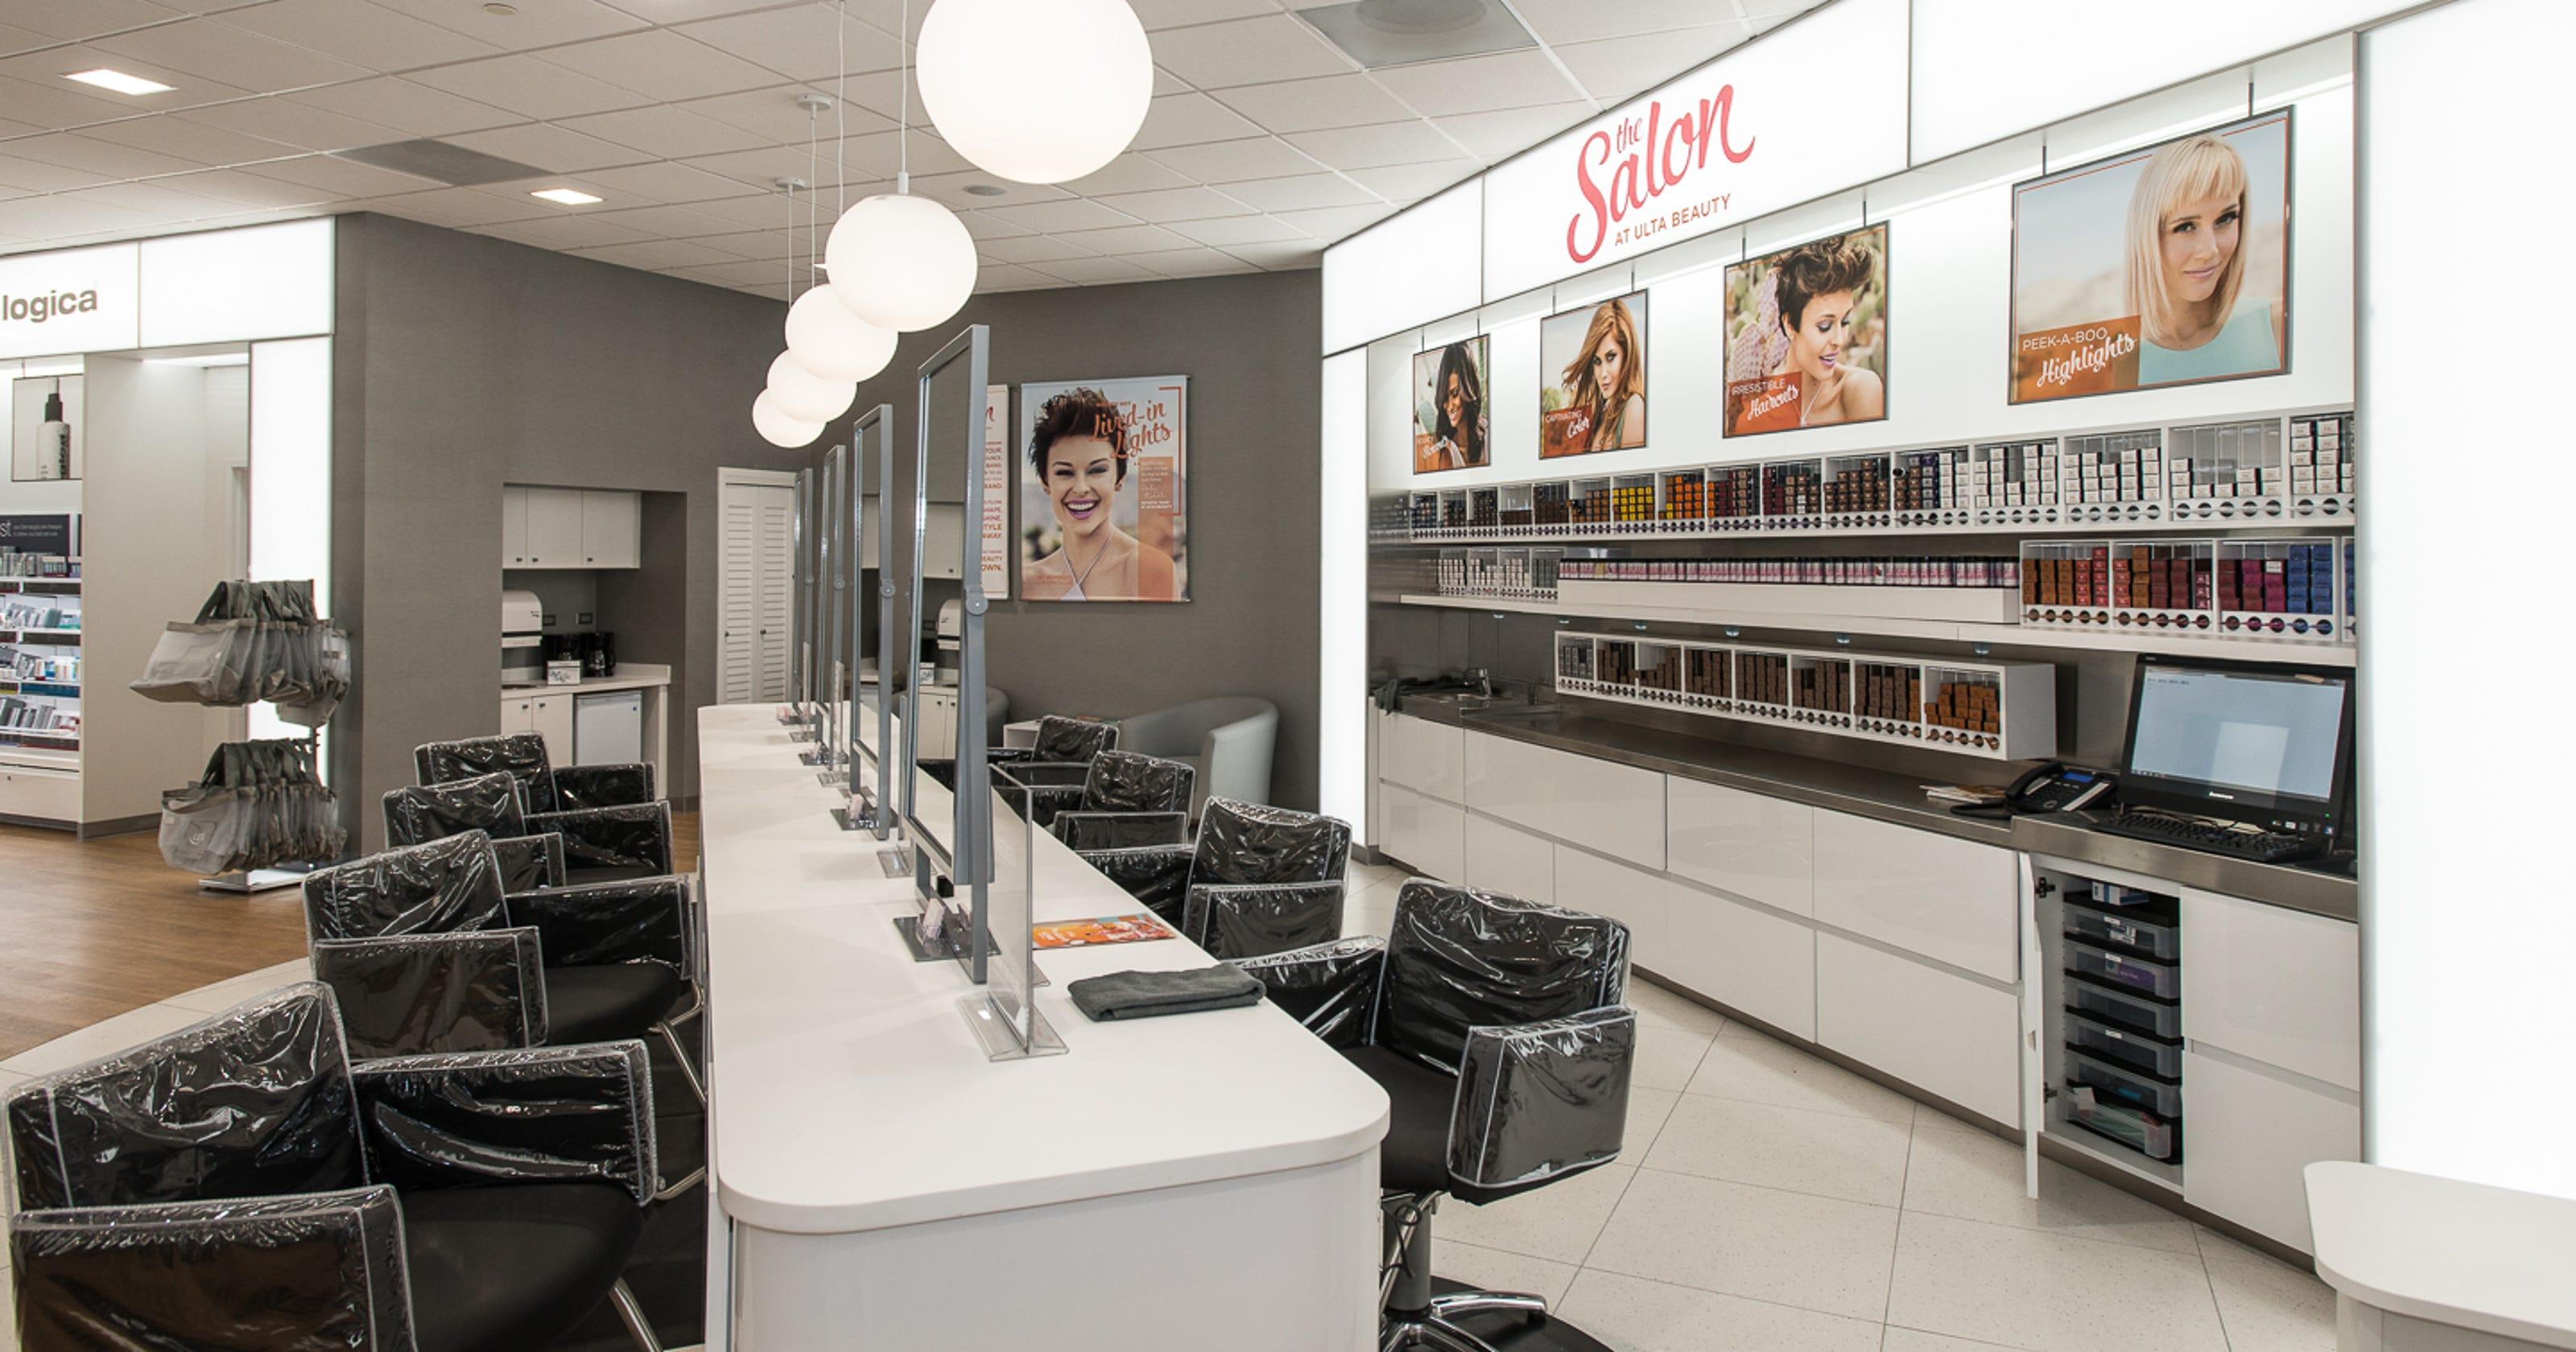 Home Spa Design Ideas: Ulta Beauty Cosmetics Store Coming To Bellevue